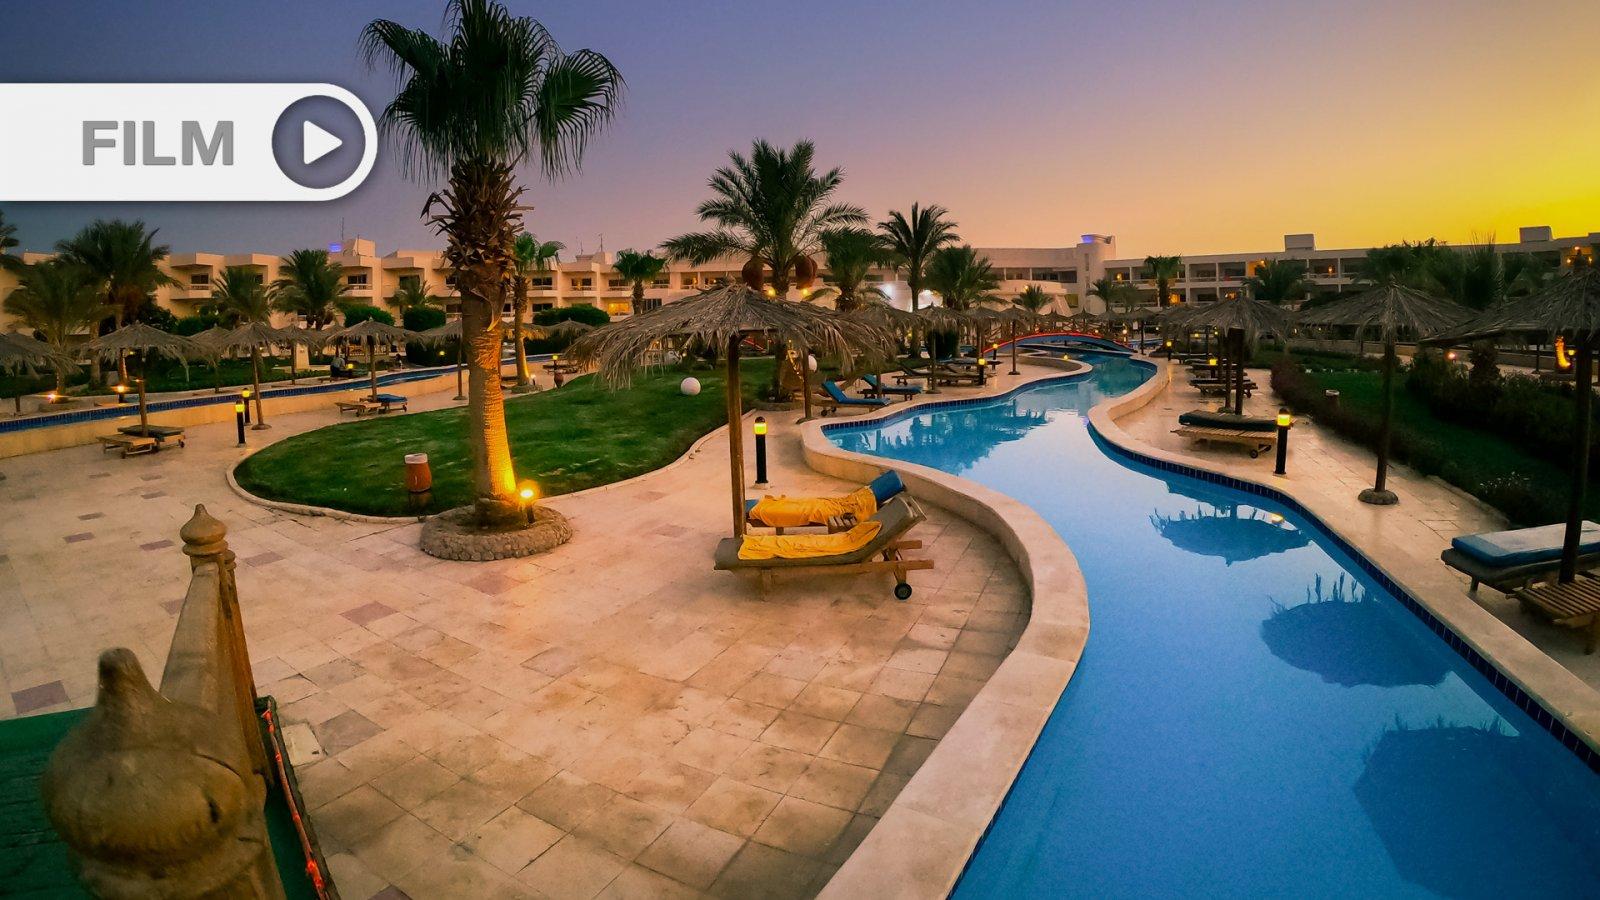 Hurghada i Al-Dżuna cz.1